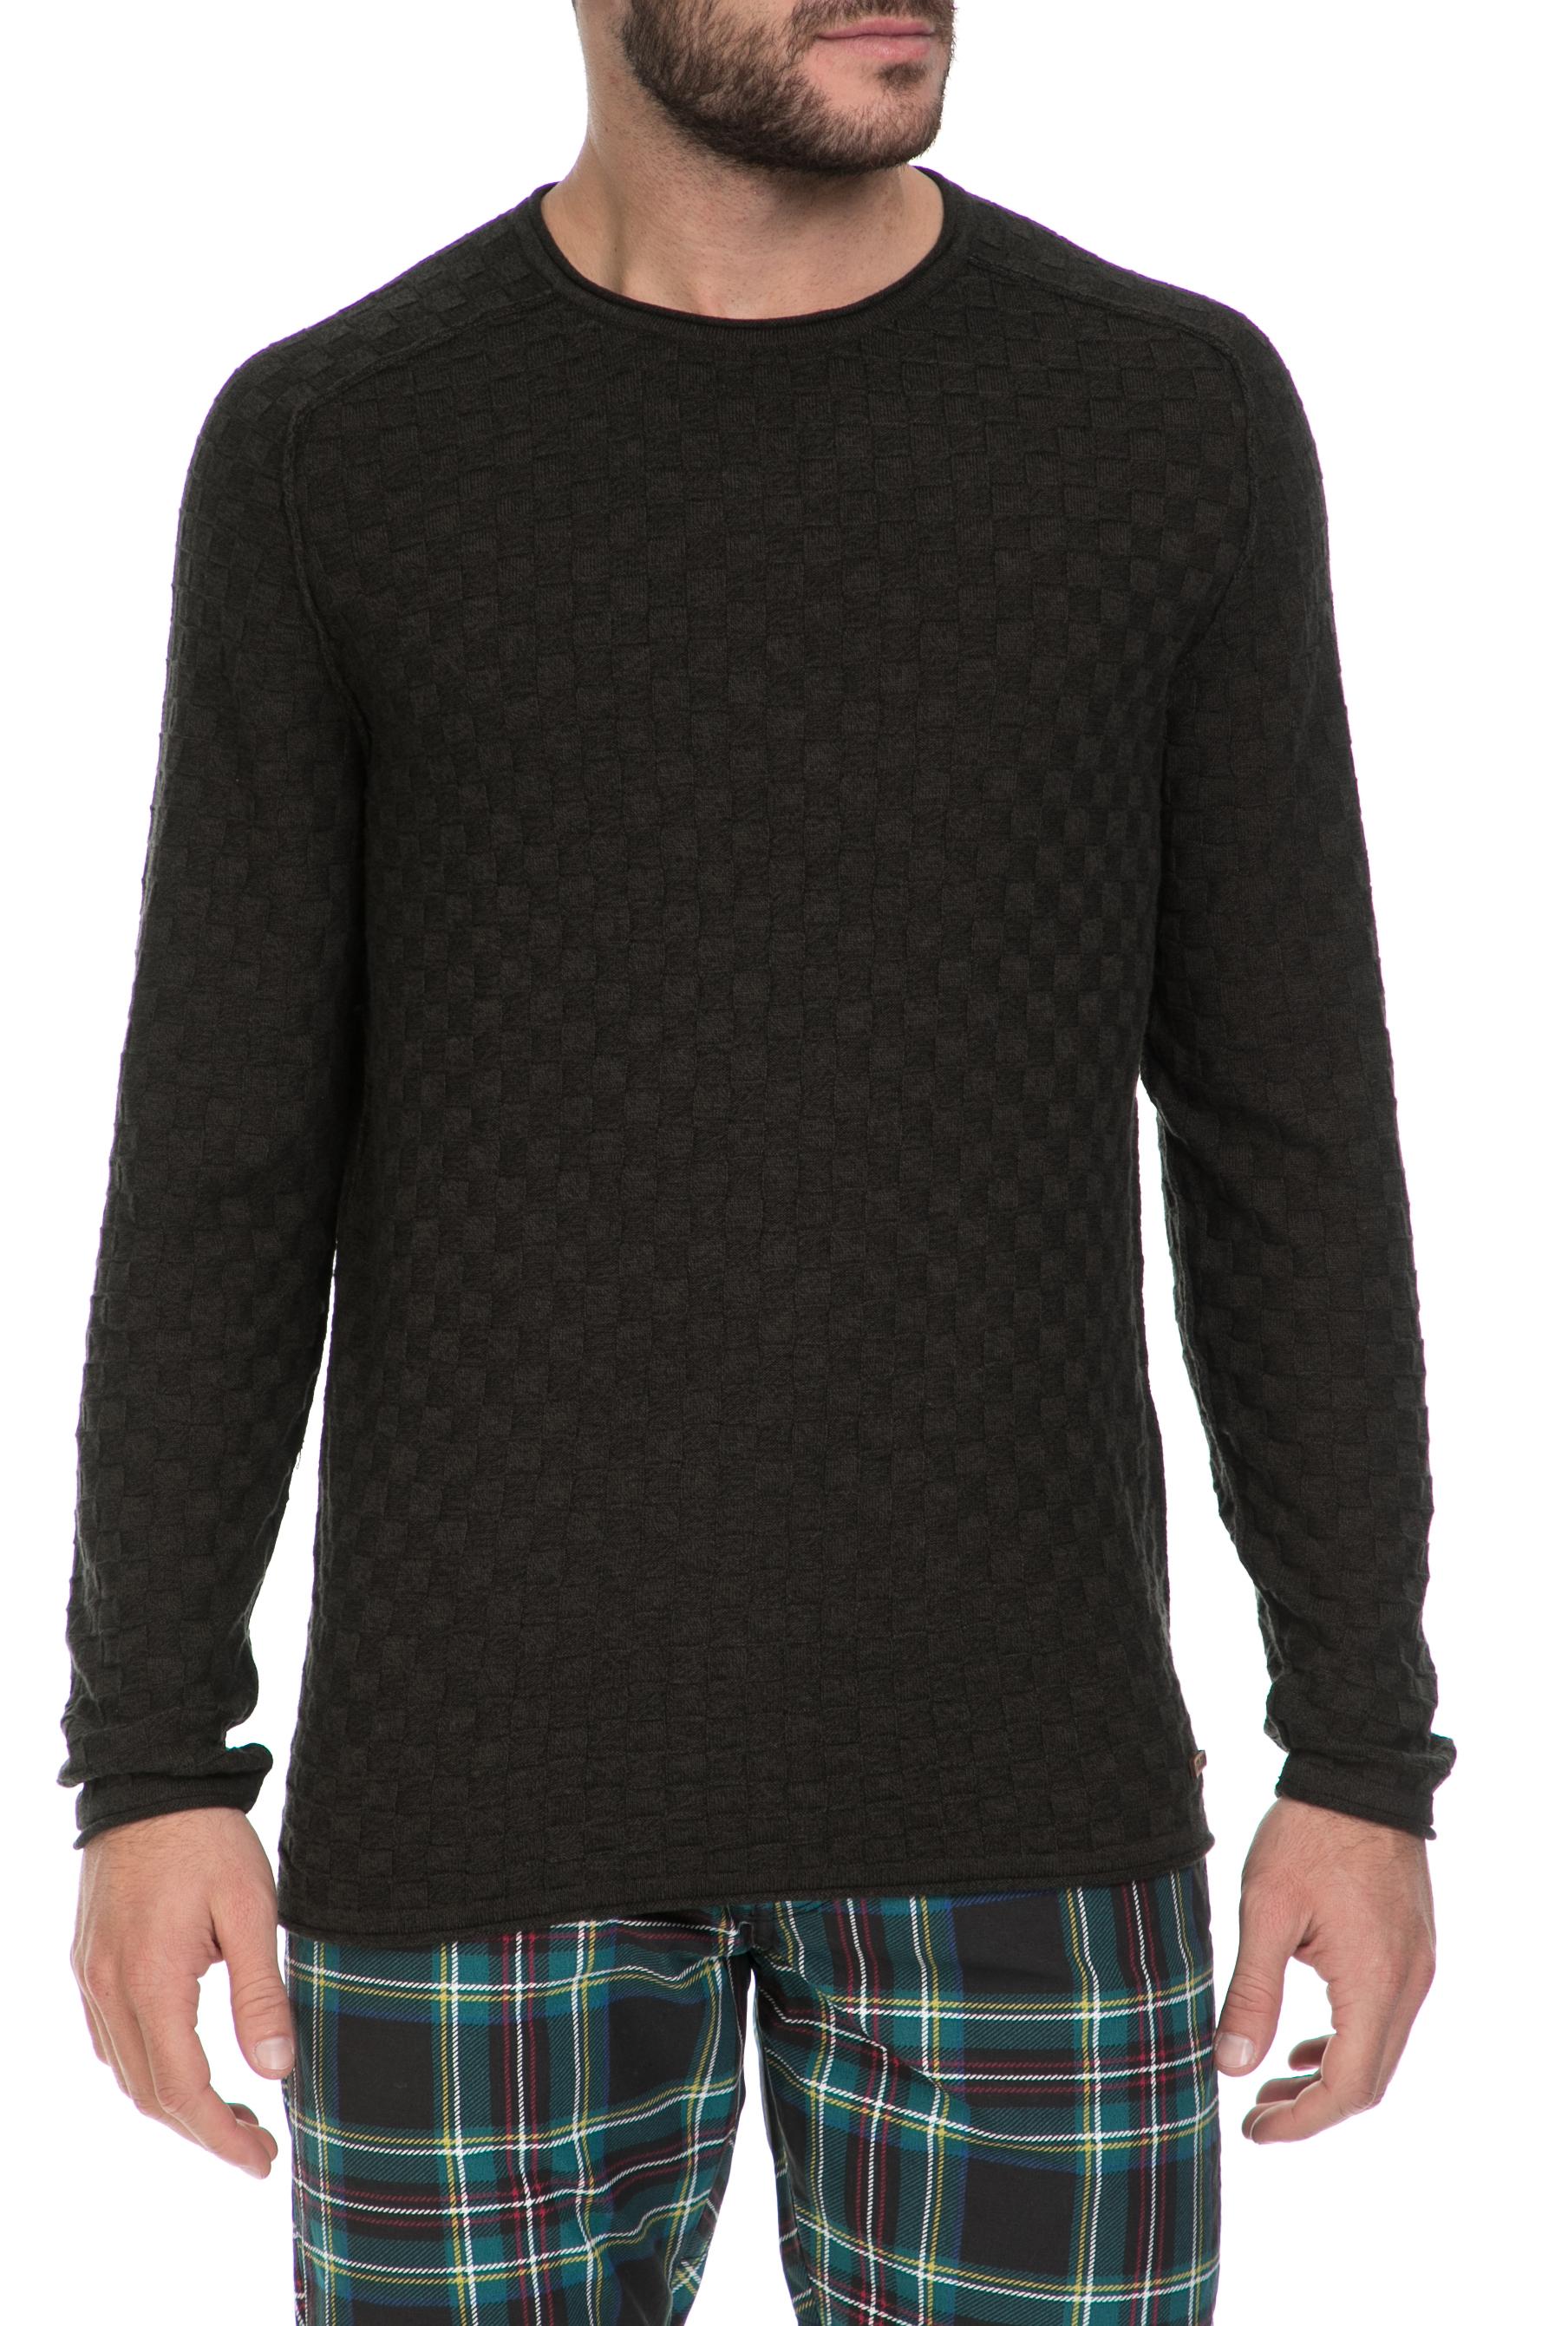 GARCIA JEANS - Ανδρικό πουλόβερ GARCIA JEANS καφέ ανδρικά ρούχα πλεκτά ζακέτες μπλούζες